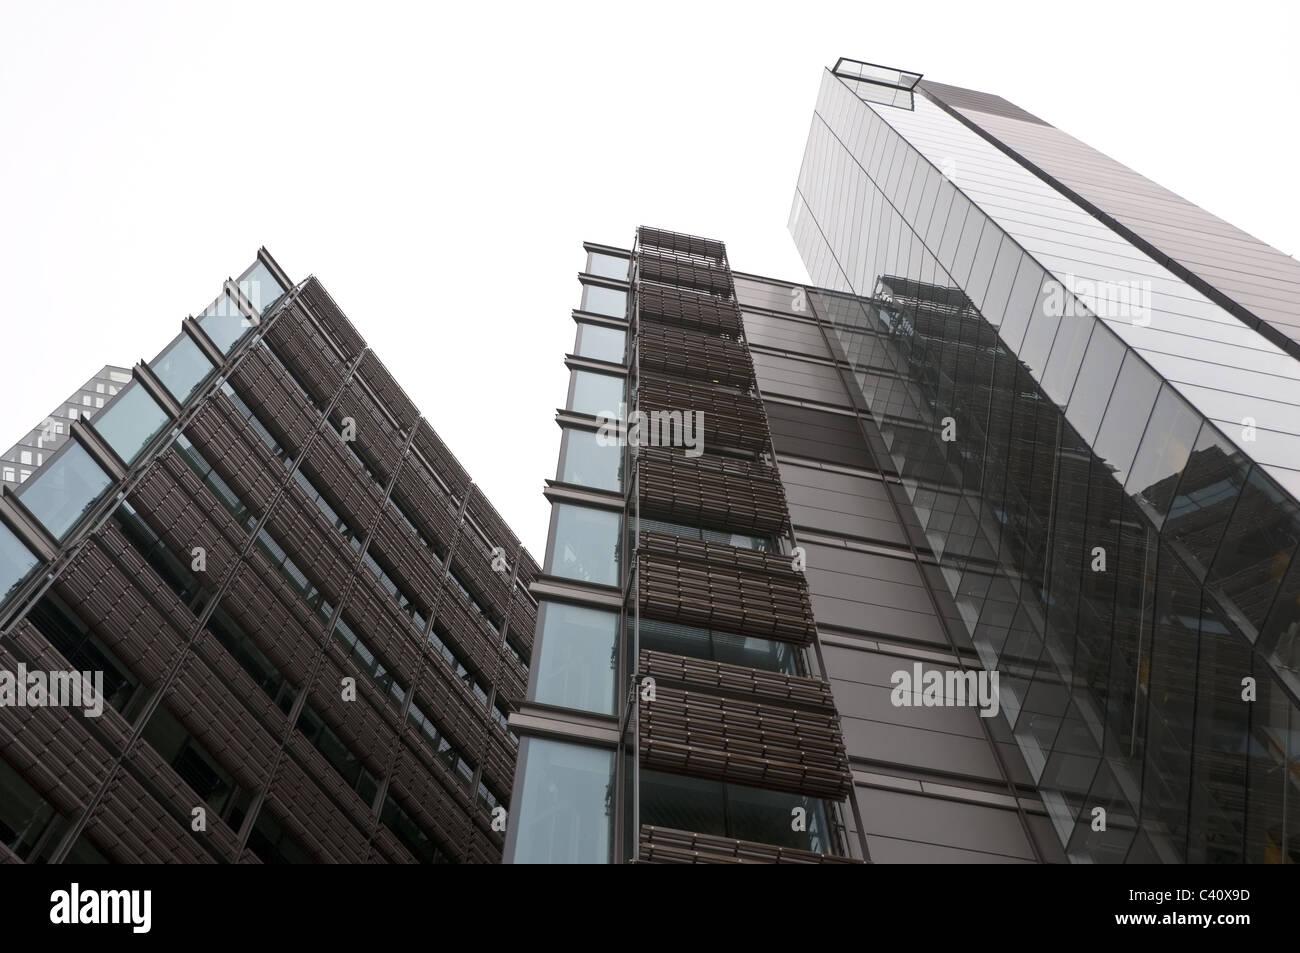 Moderna, contemporánea de la arquitectura de cristal, edificio de oficinas en Paddington Basin Waterfront, Imagen De Stock